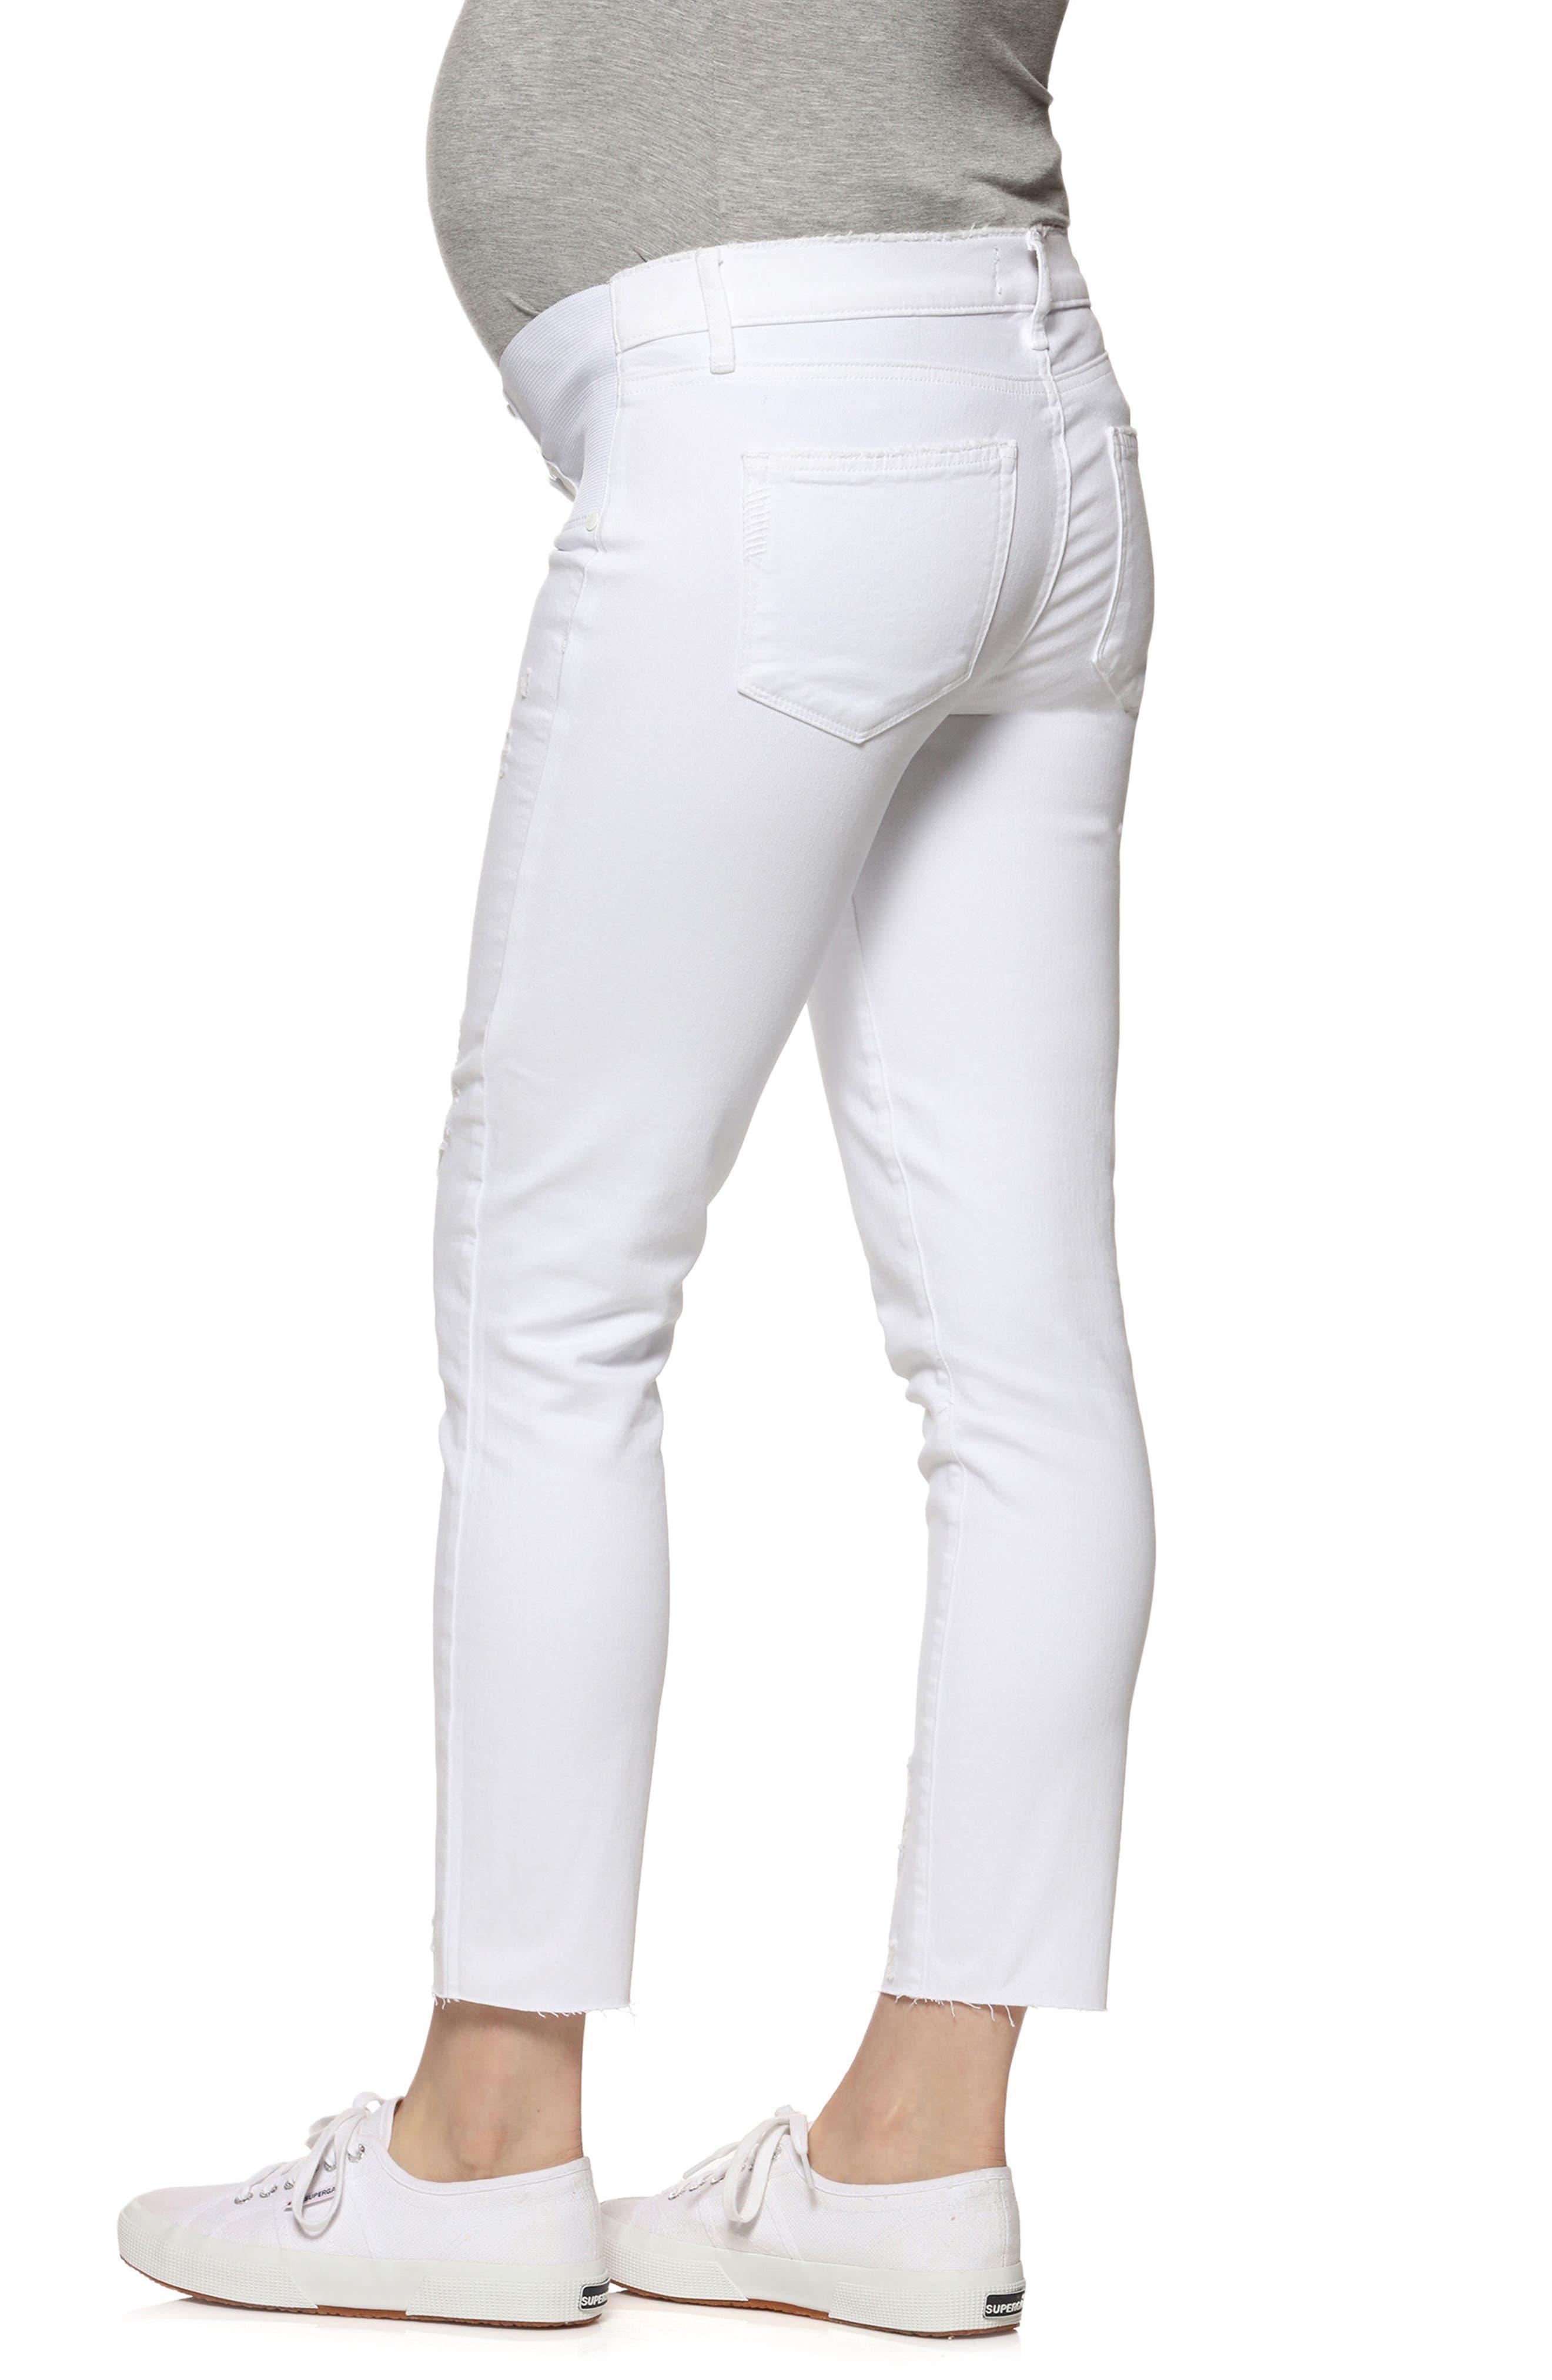 Verdugo Raw Hem Crop Skinny Maternity Jeans,                             Alternate thumbnail 2, color,                             Whiteout Destructed